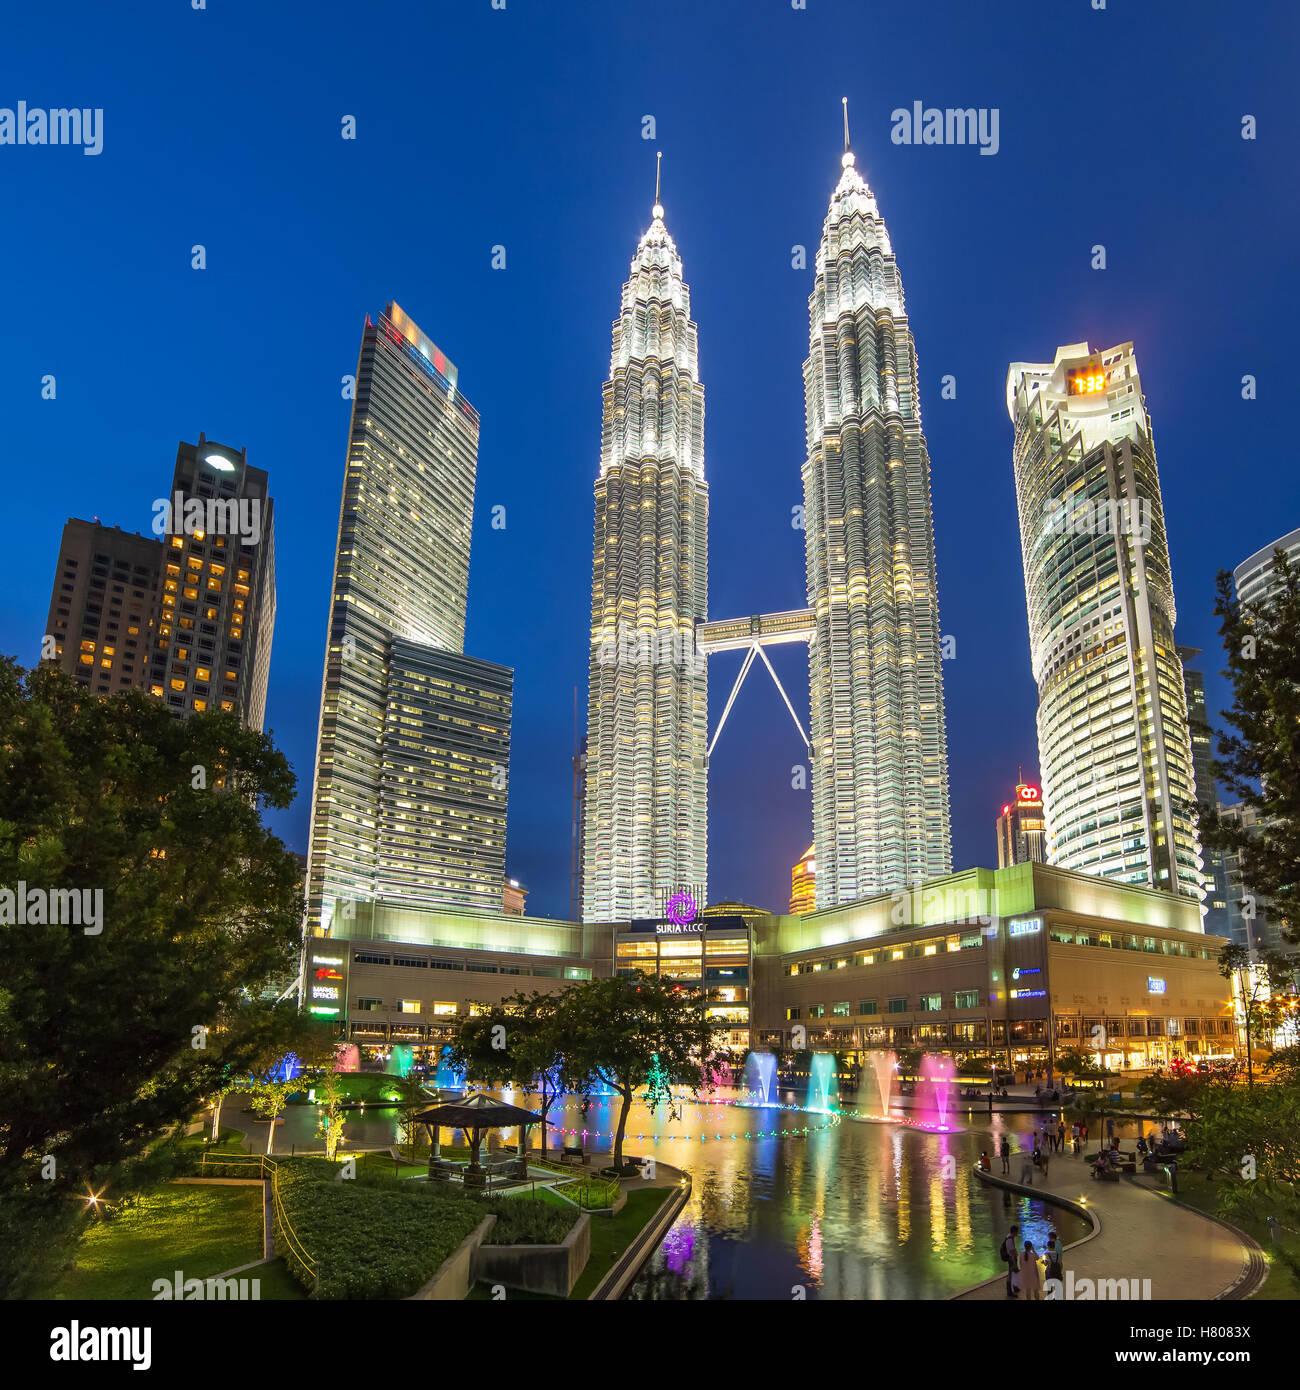 Famouse Petronas Towers at night In Kuala Lumpur, Malaysia. - Stock Image